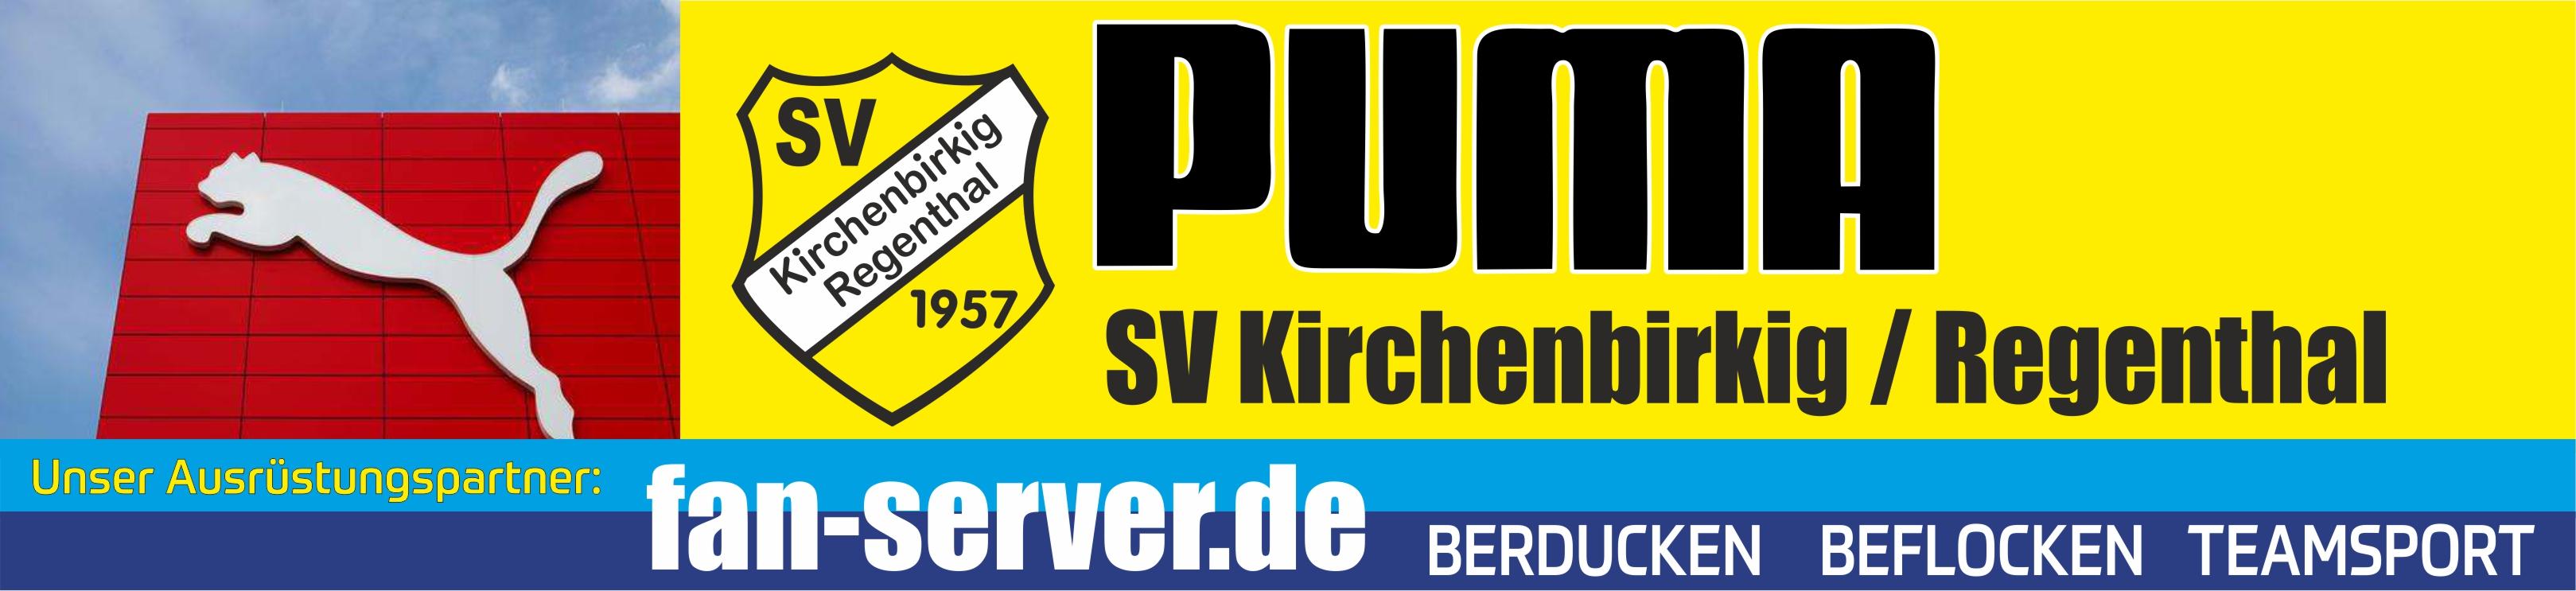 SV KIRCHENBIRKIG/REGENTHAL